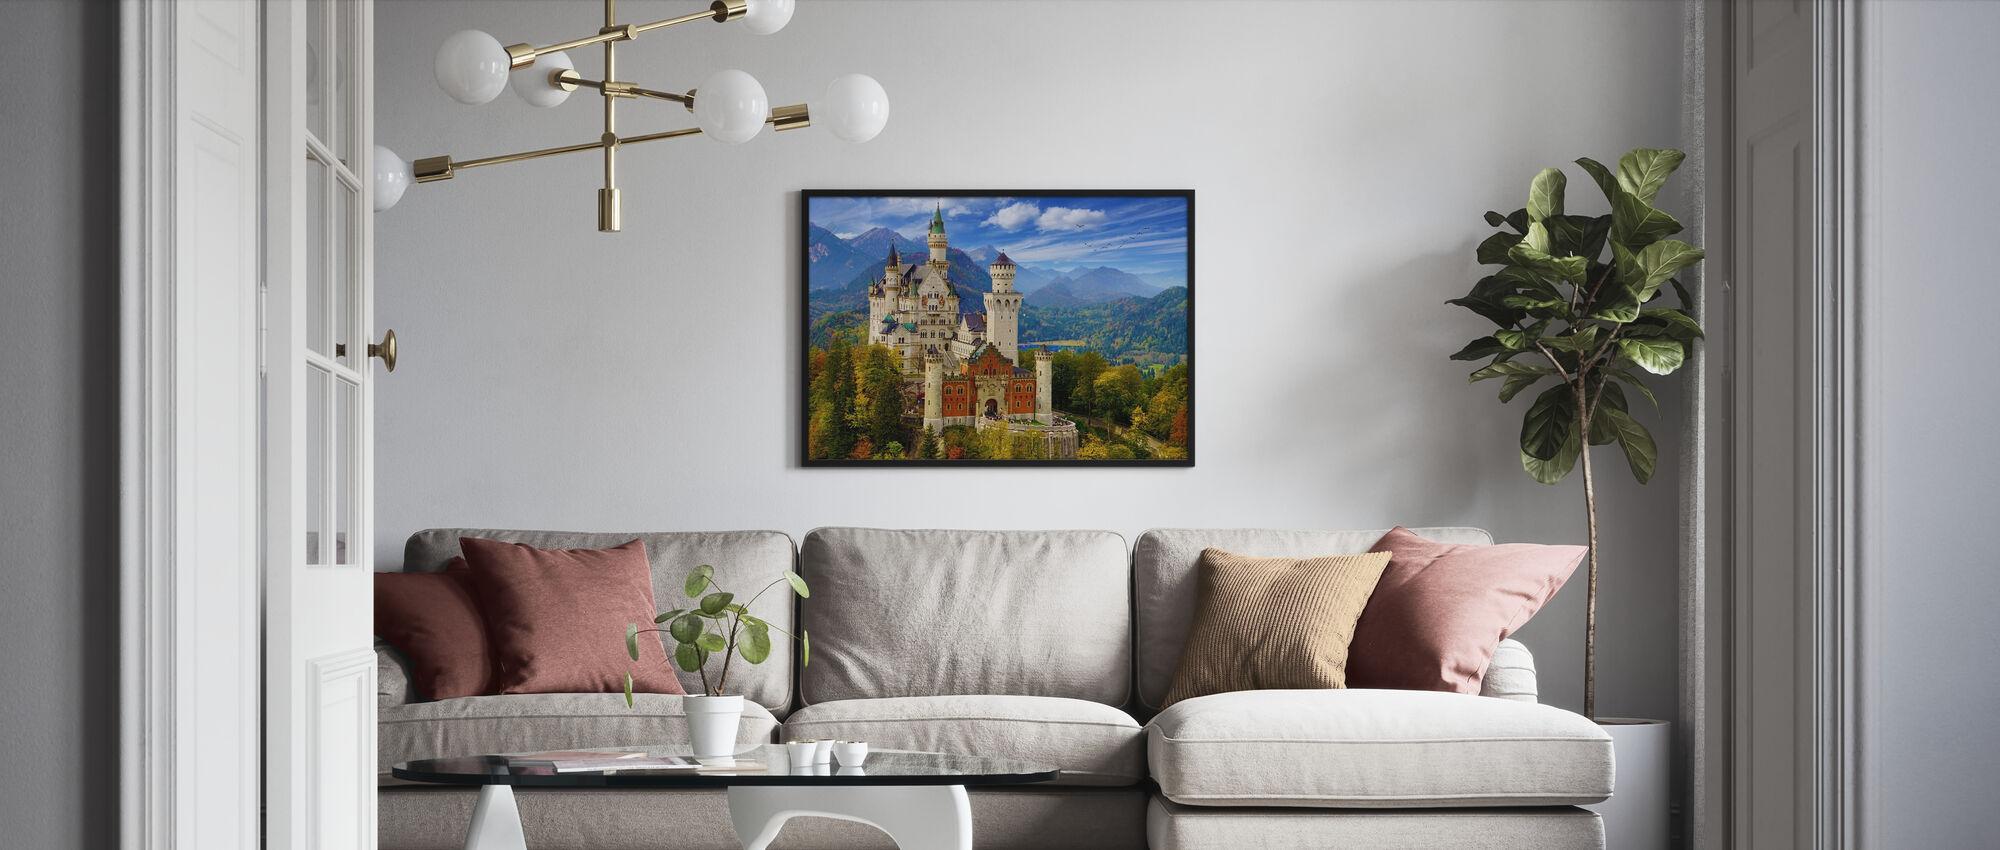 Neuschwanstein Castle - Poster - Living Room